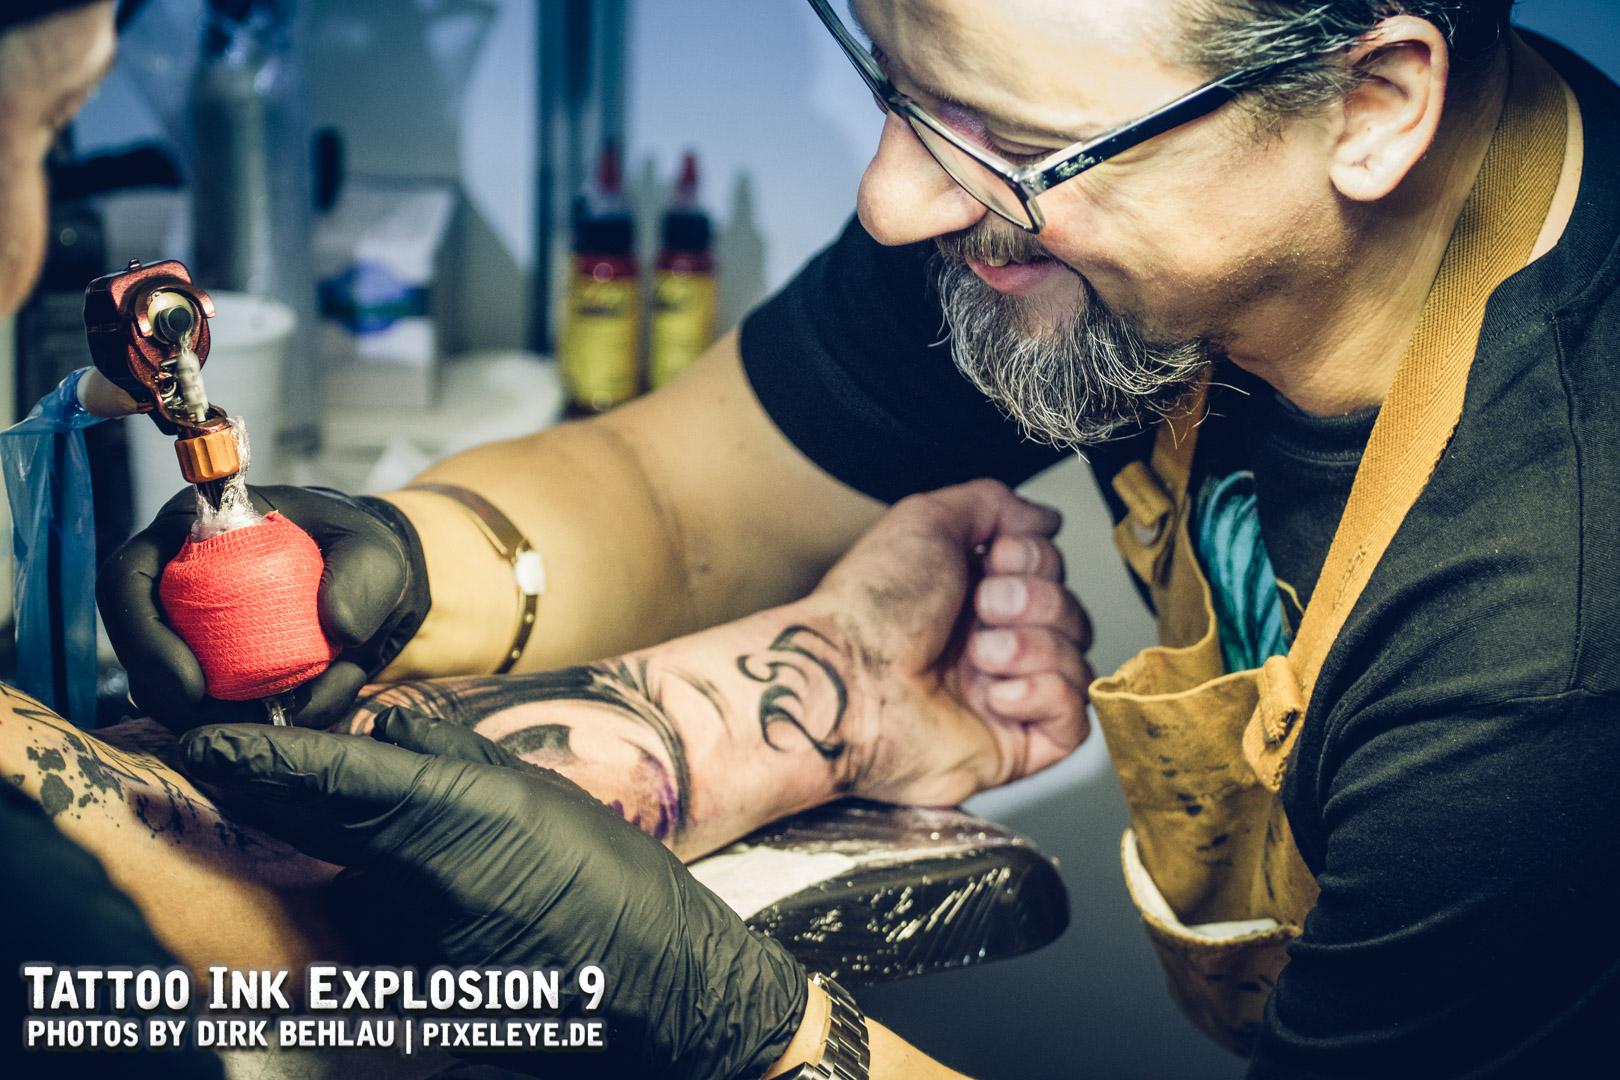 Tattoo Ink Explosion 2018 WEB by Dirk Behlau-1328.jpg